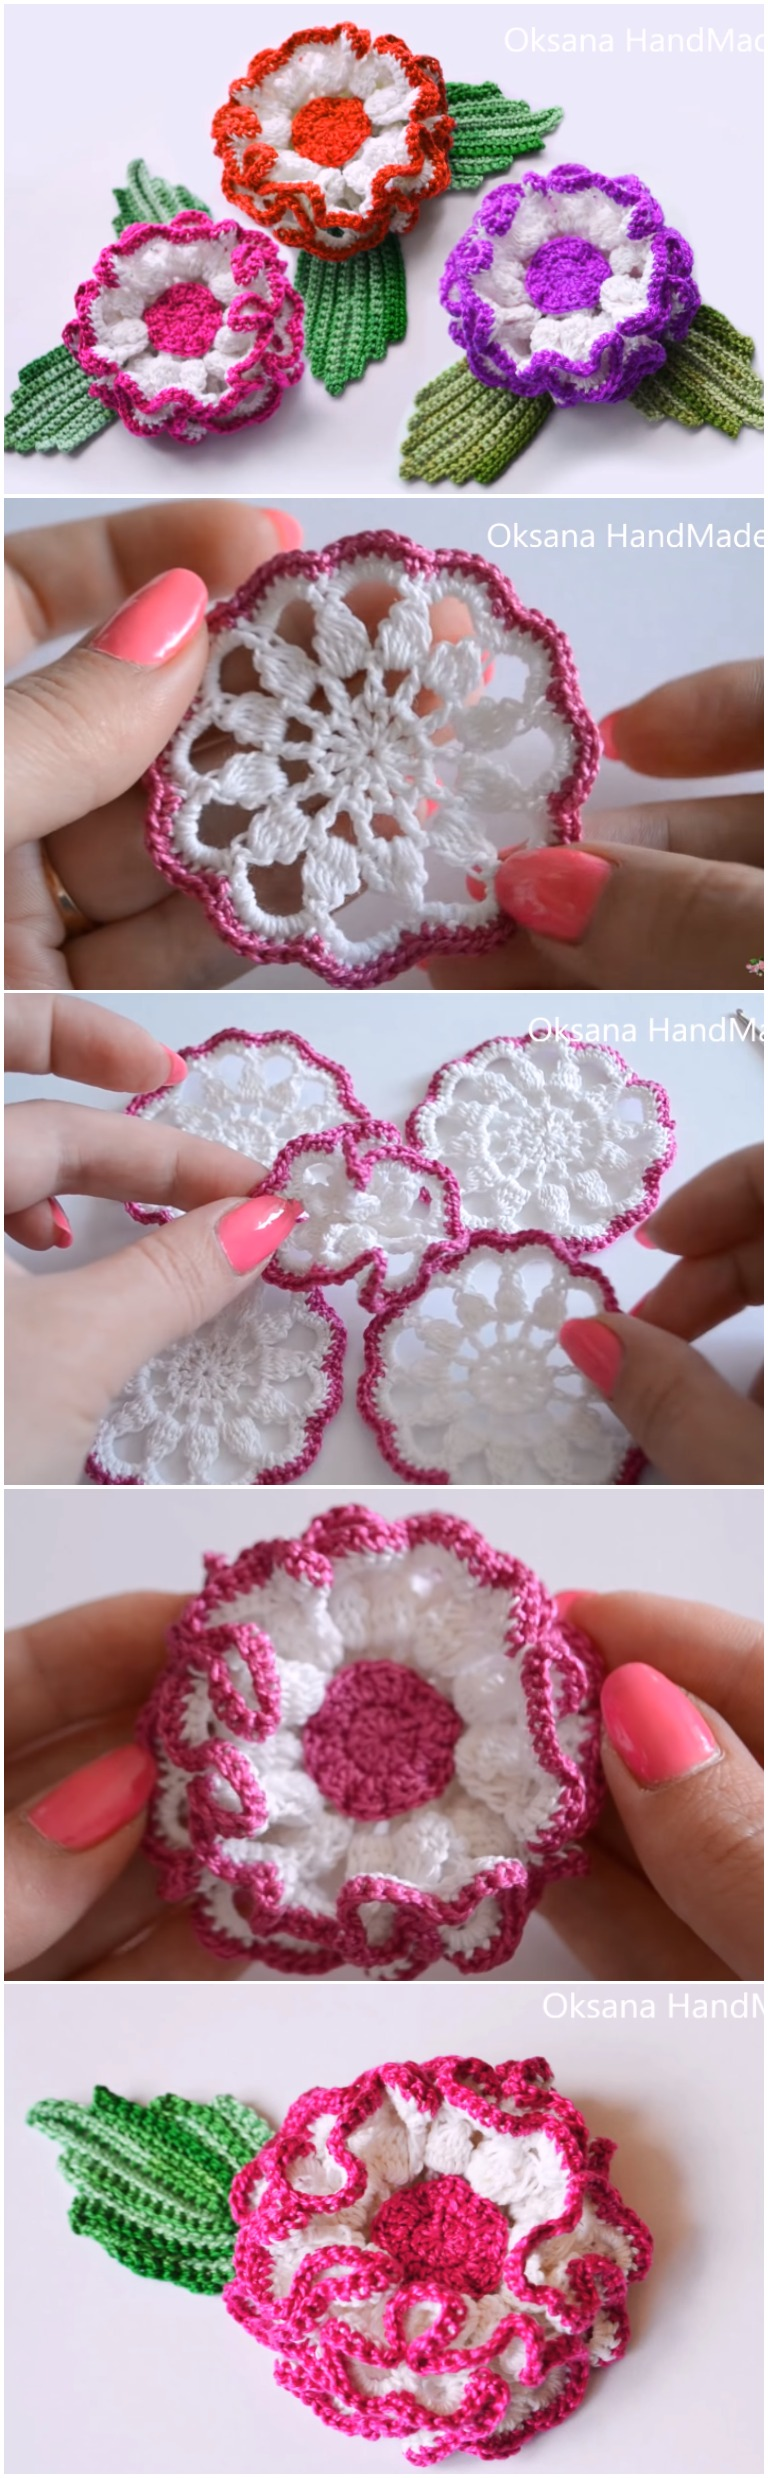 Crochet Daisy Flower Step By Step